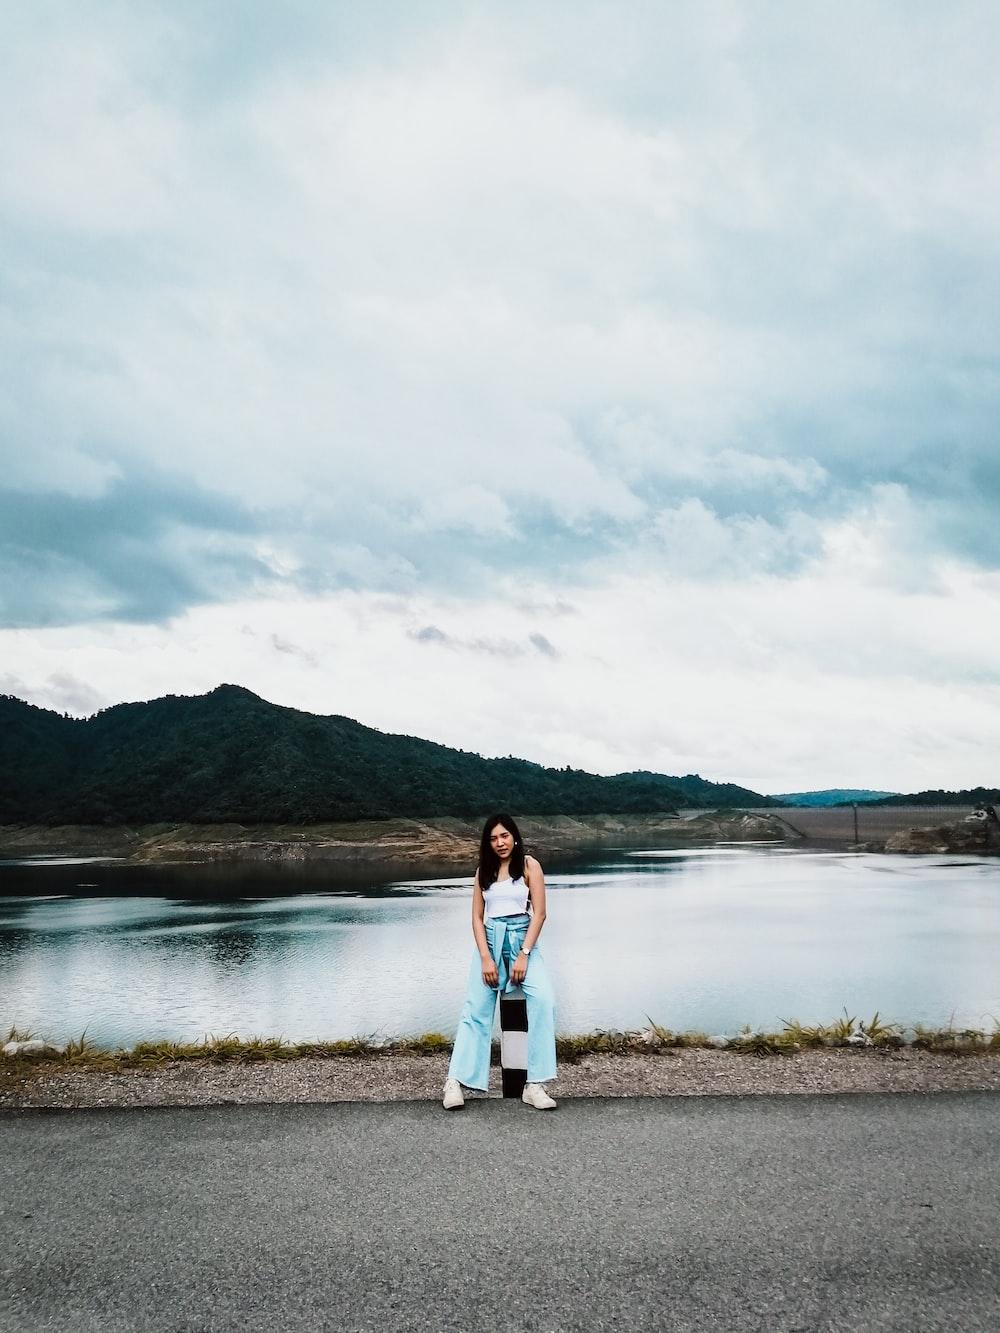 woman in white sleeveless shirt sitting near body of water during daytime